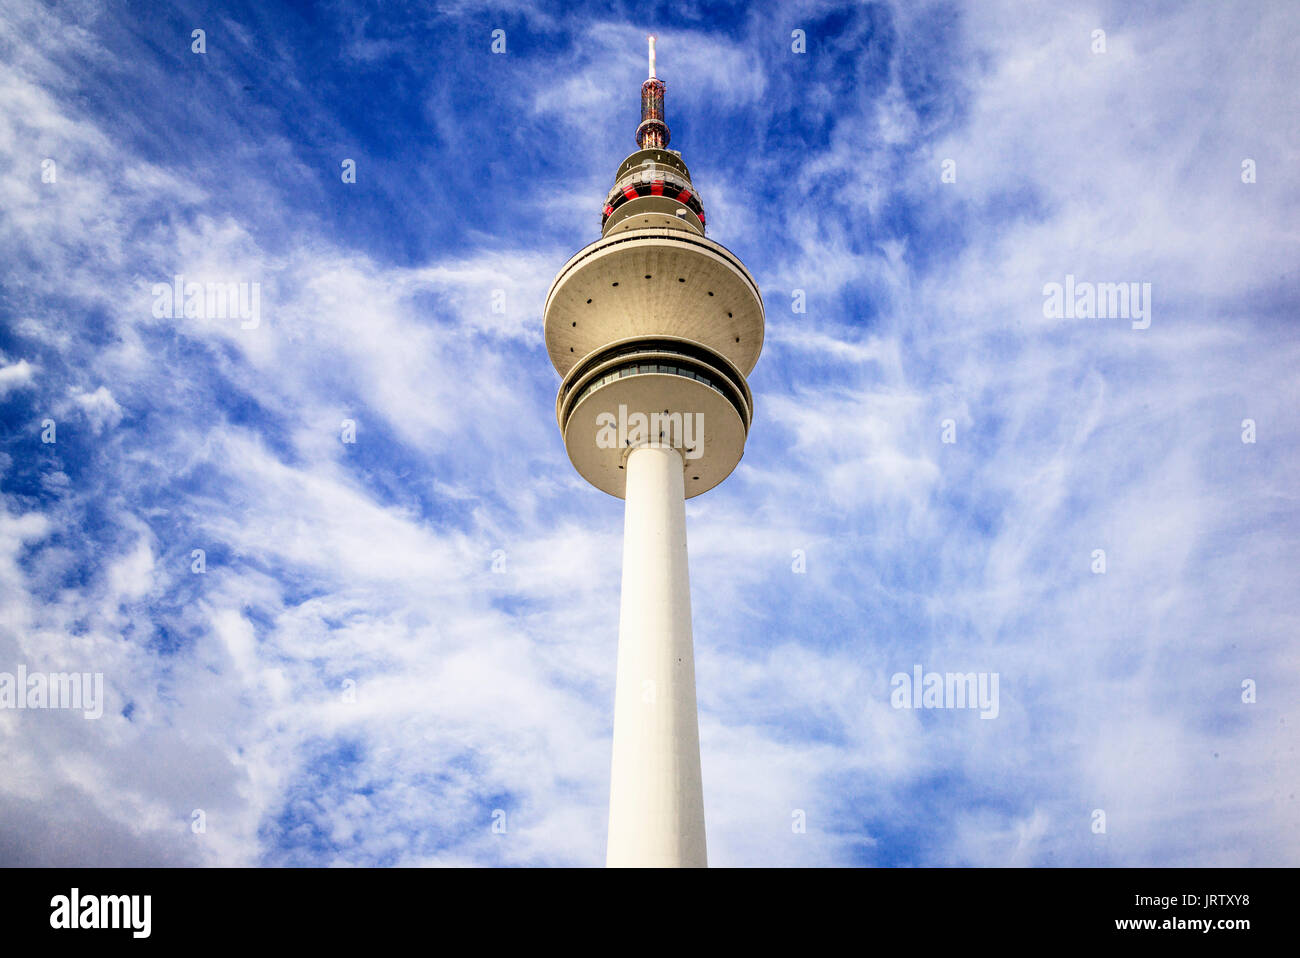 Fernsehturm in Hamburg, Deutschland Stockbild